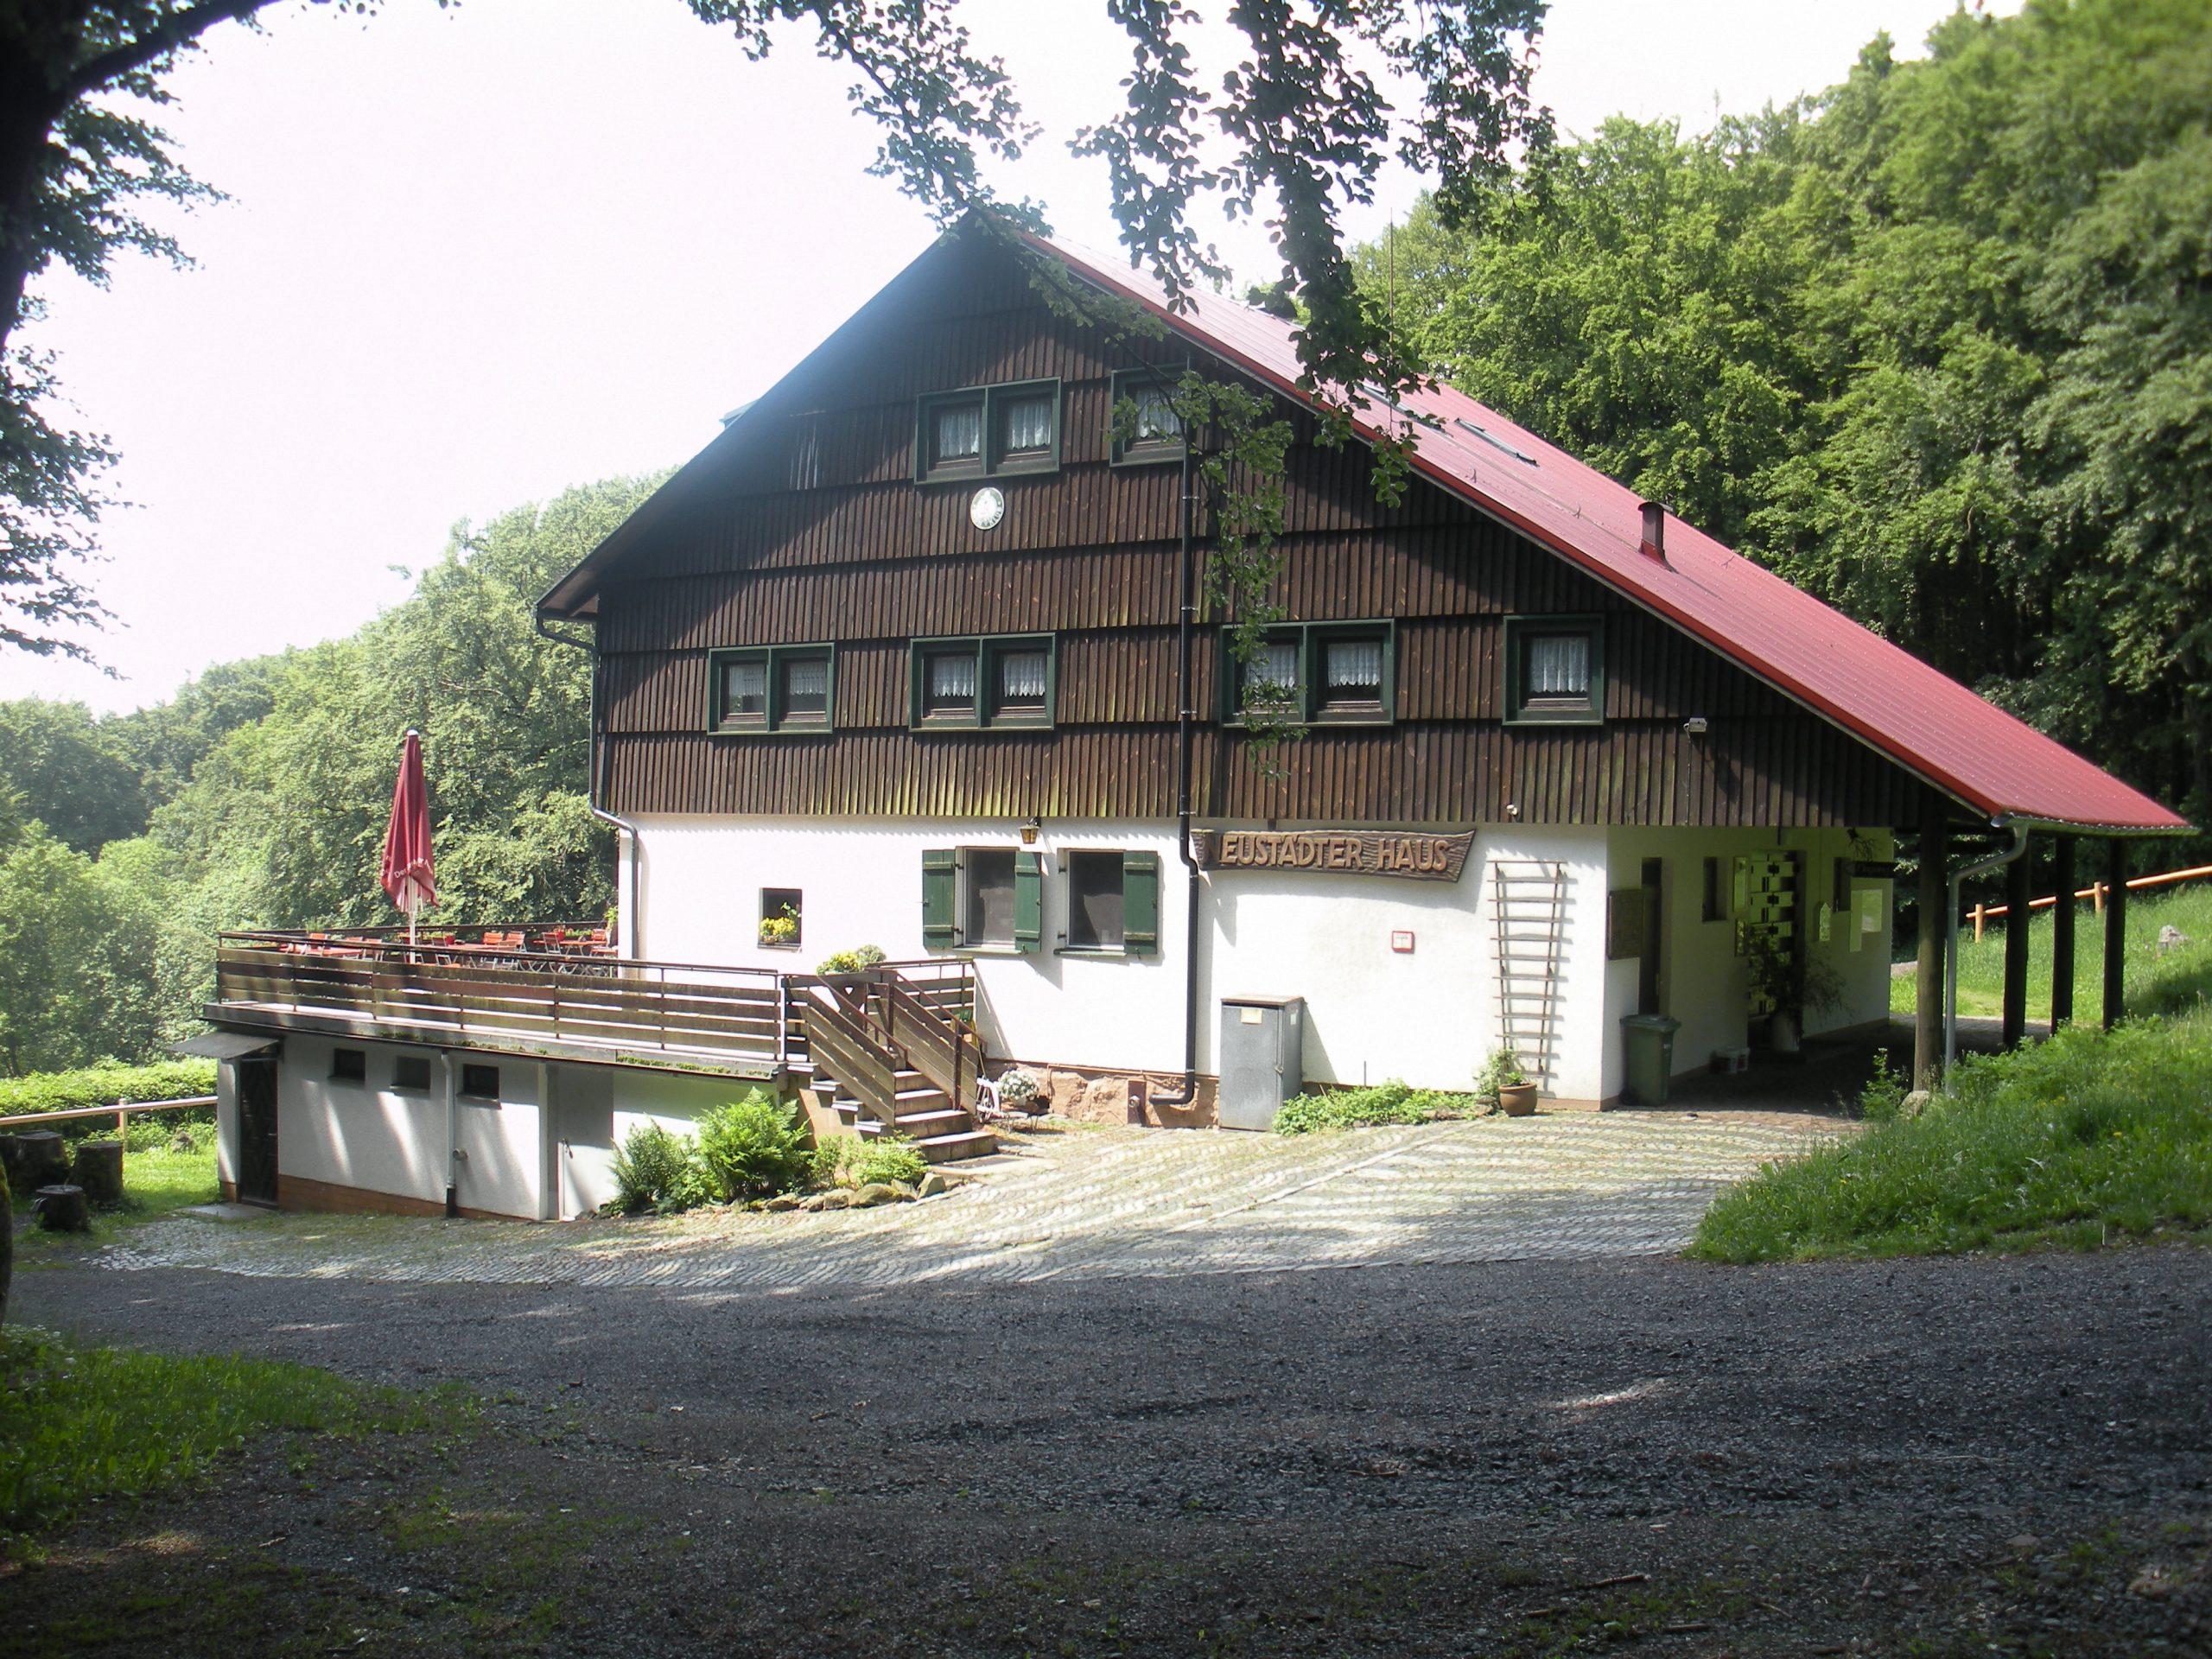 Neustädter Haus